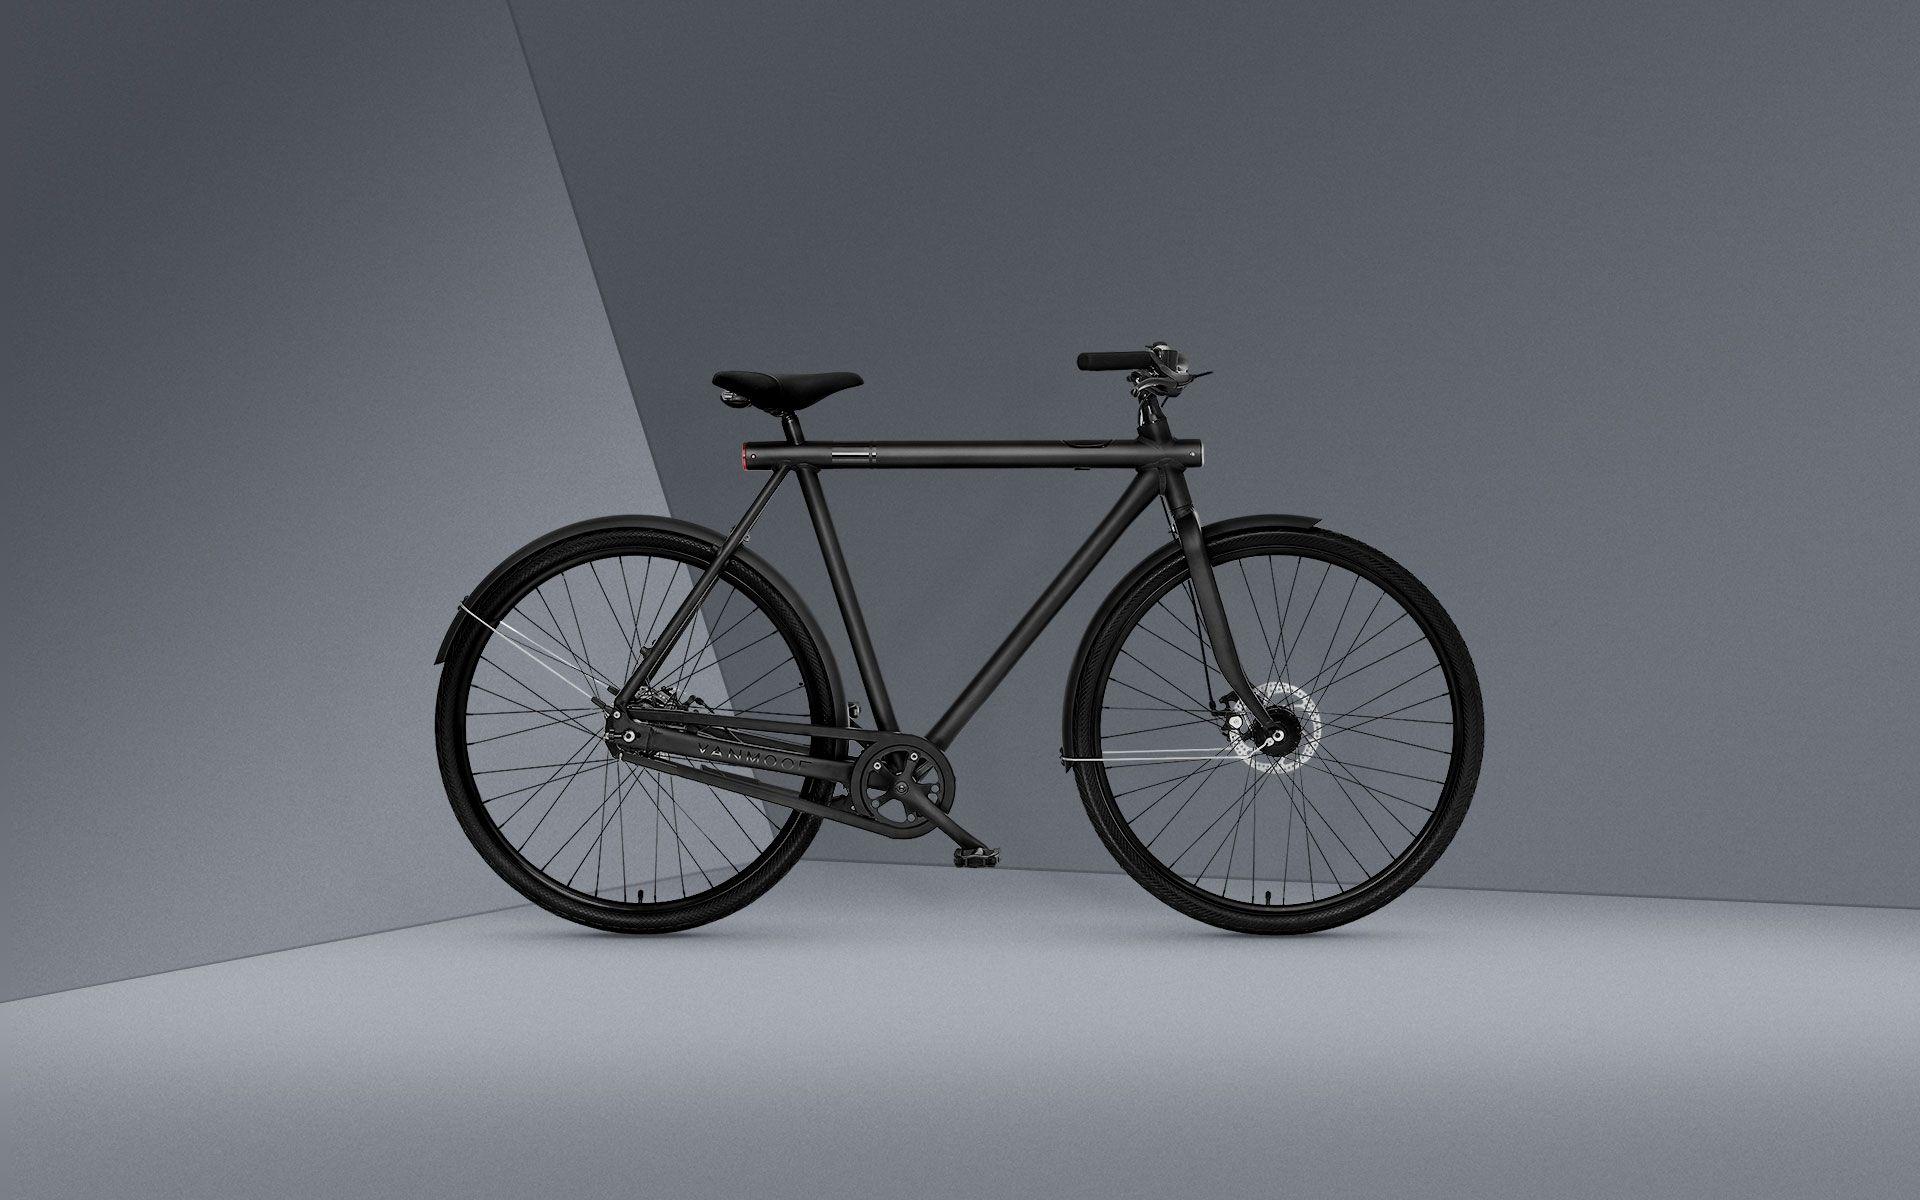 Smart with Straight frame - VanMoof | Bike | Pinterest | Urban bike ...